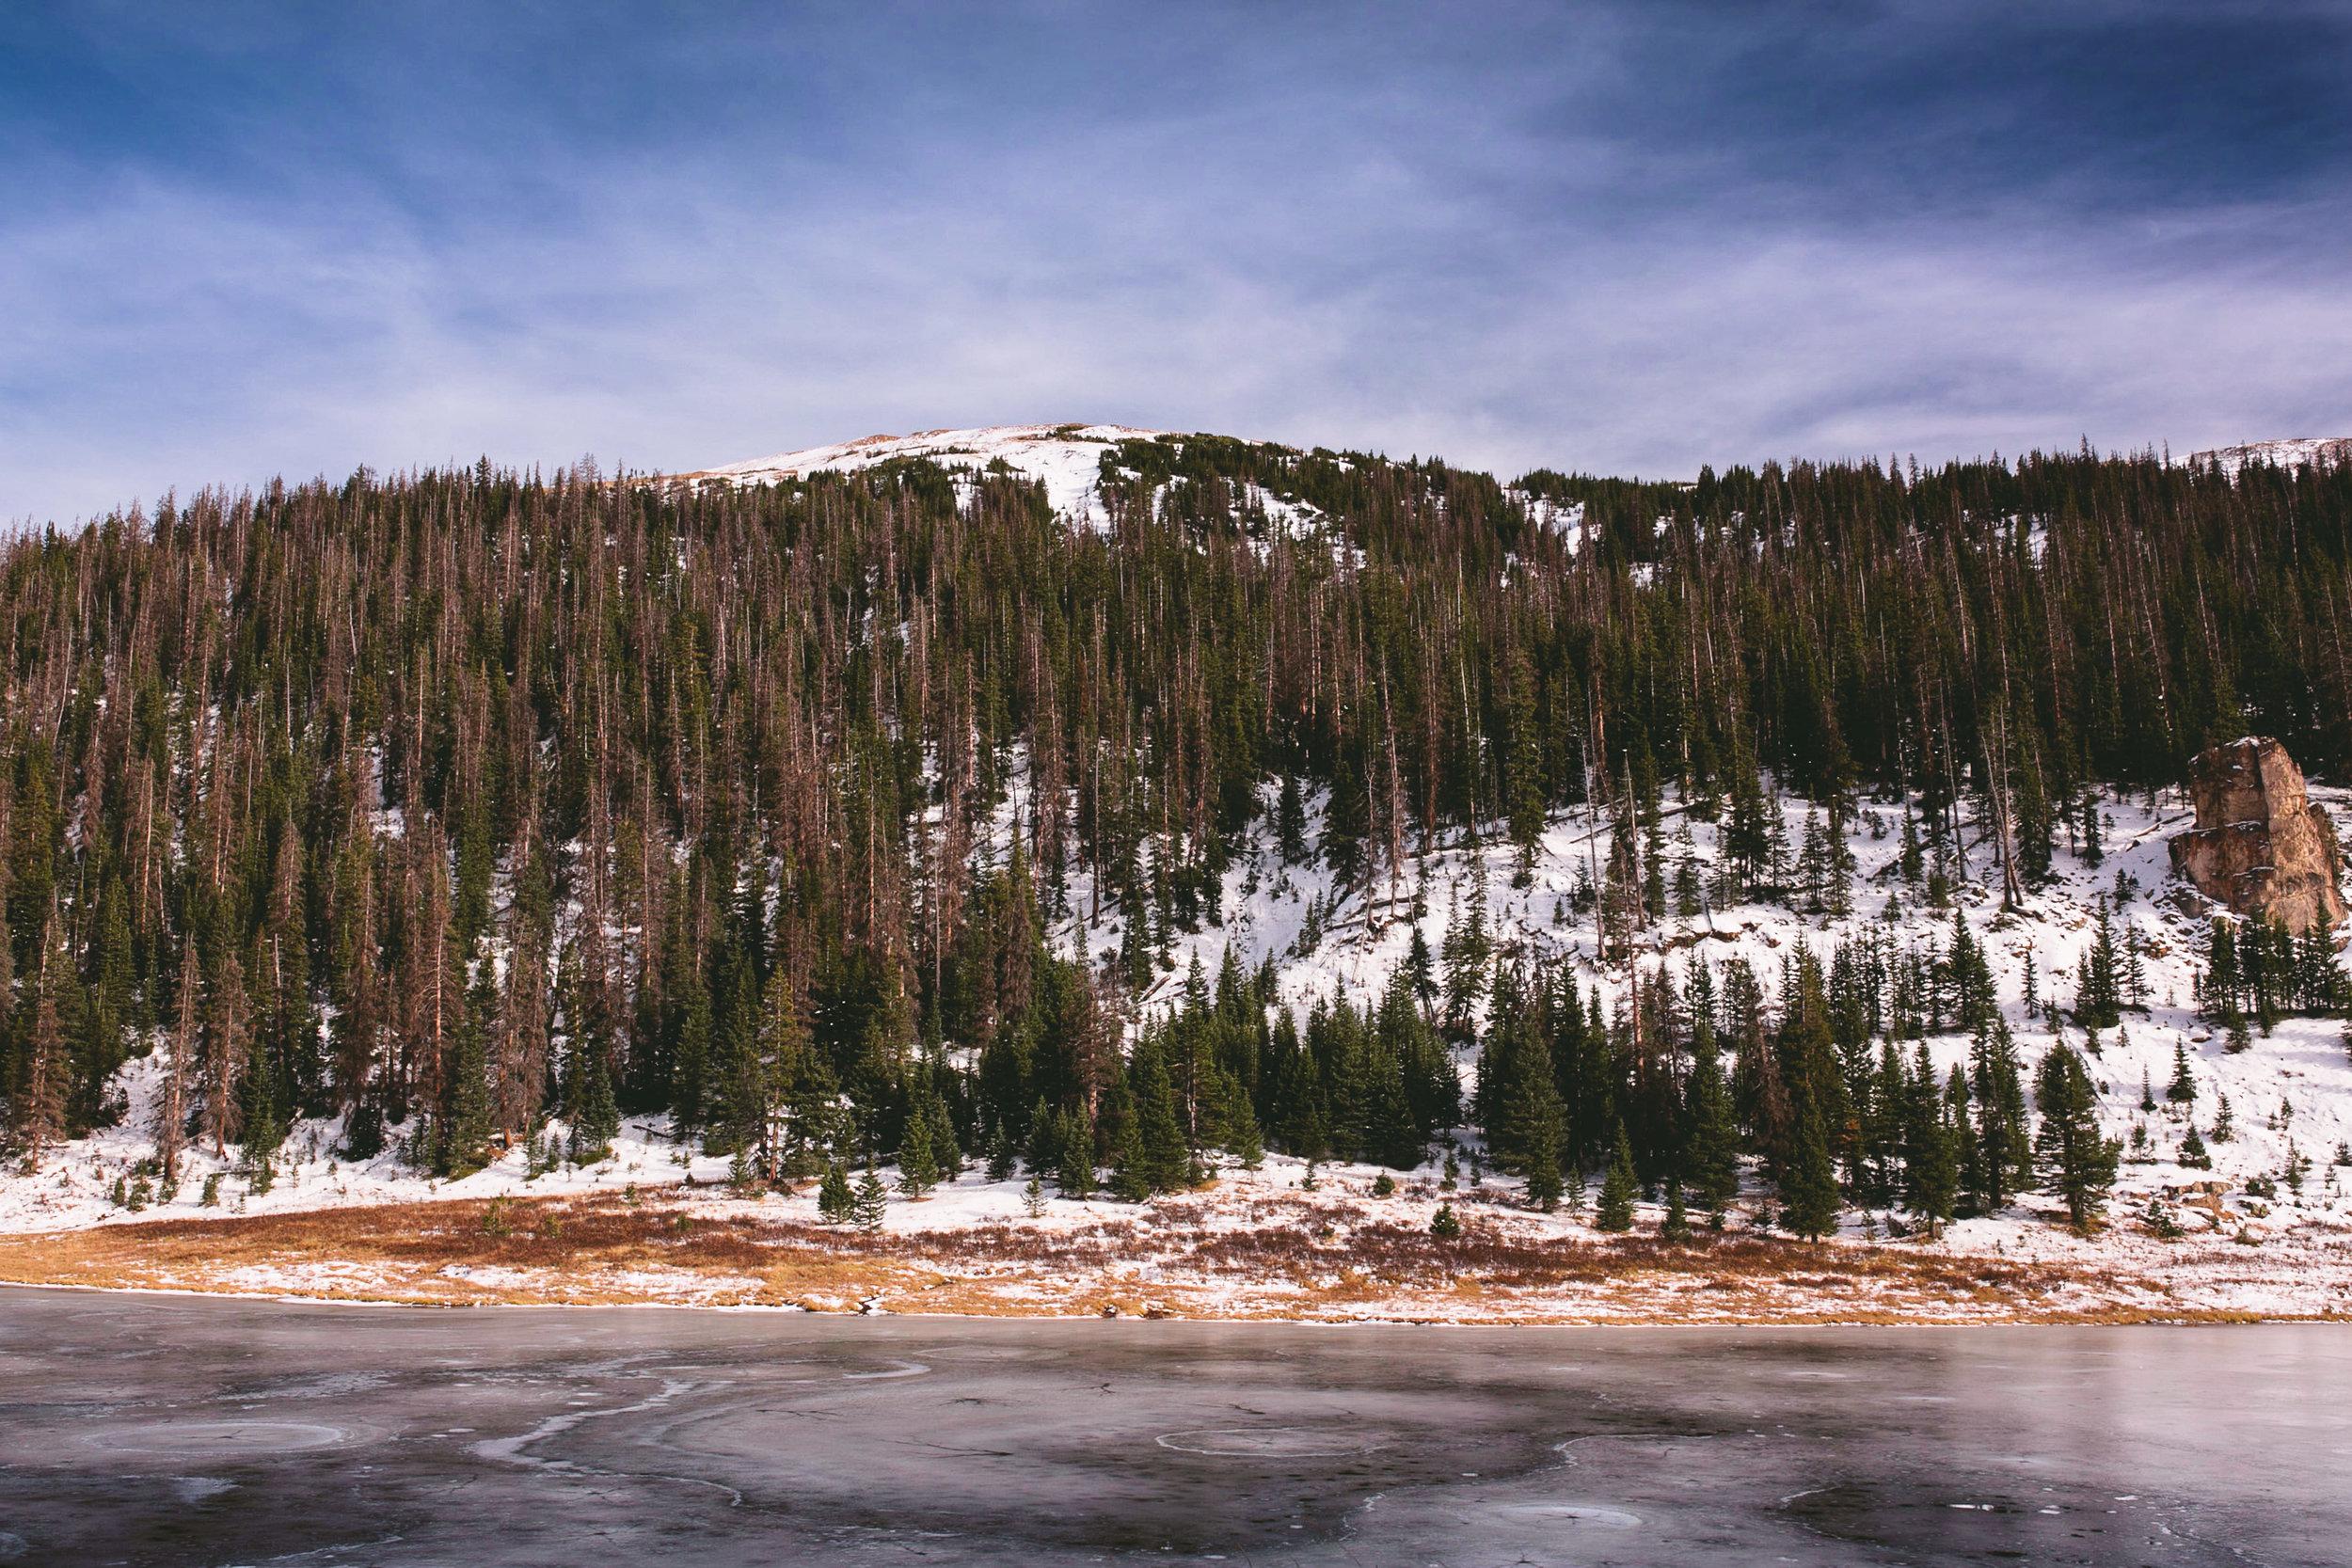 SS-Port-Snow-3.jpg